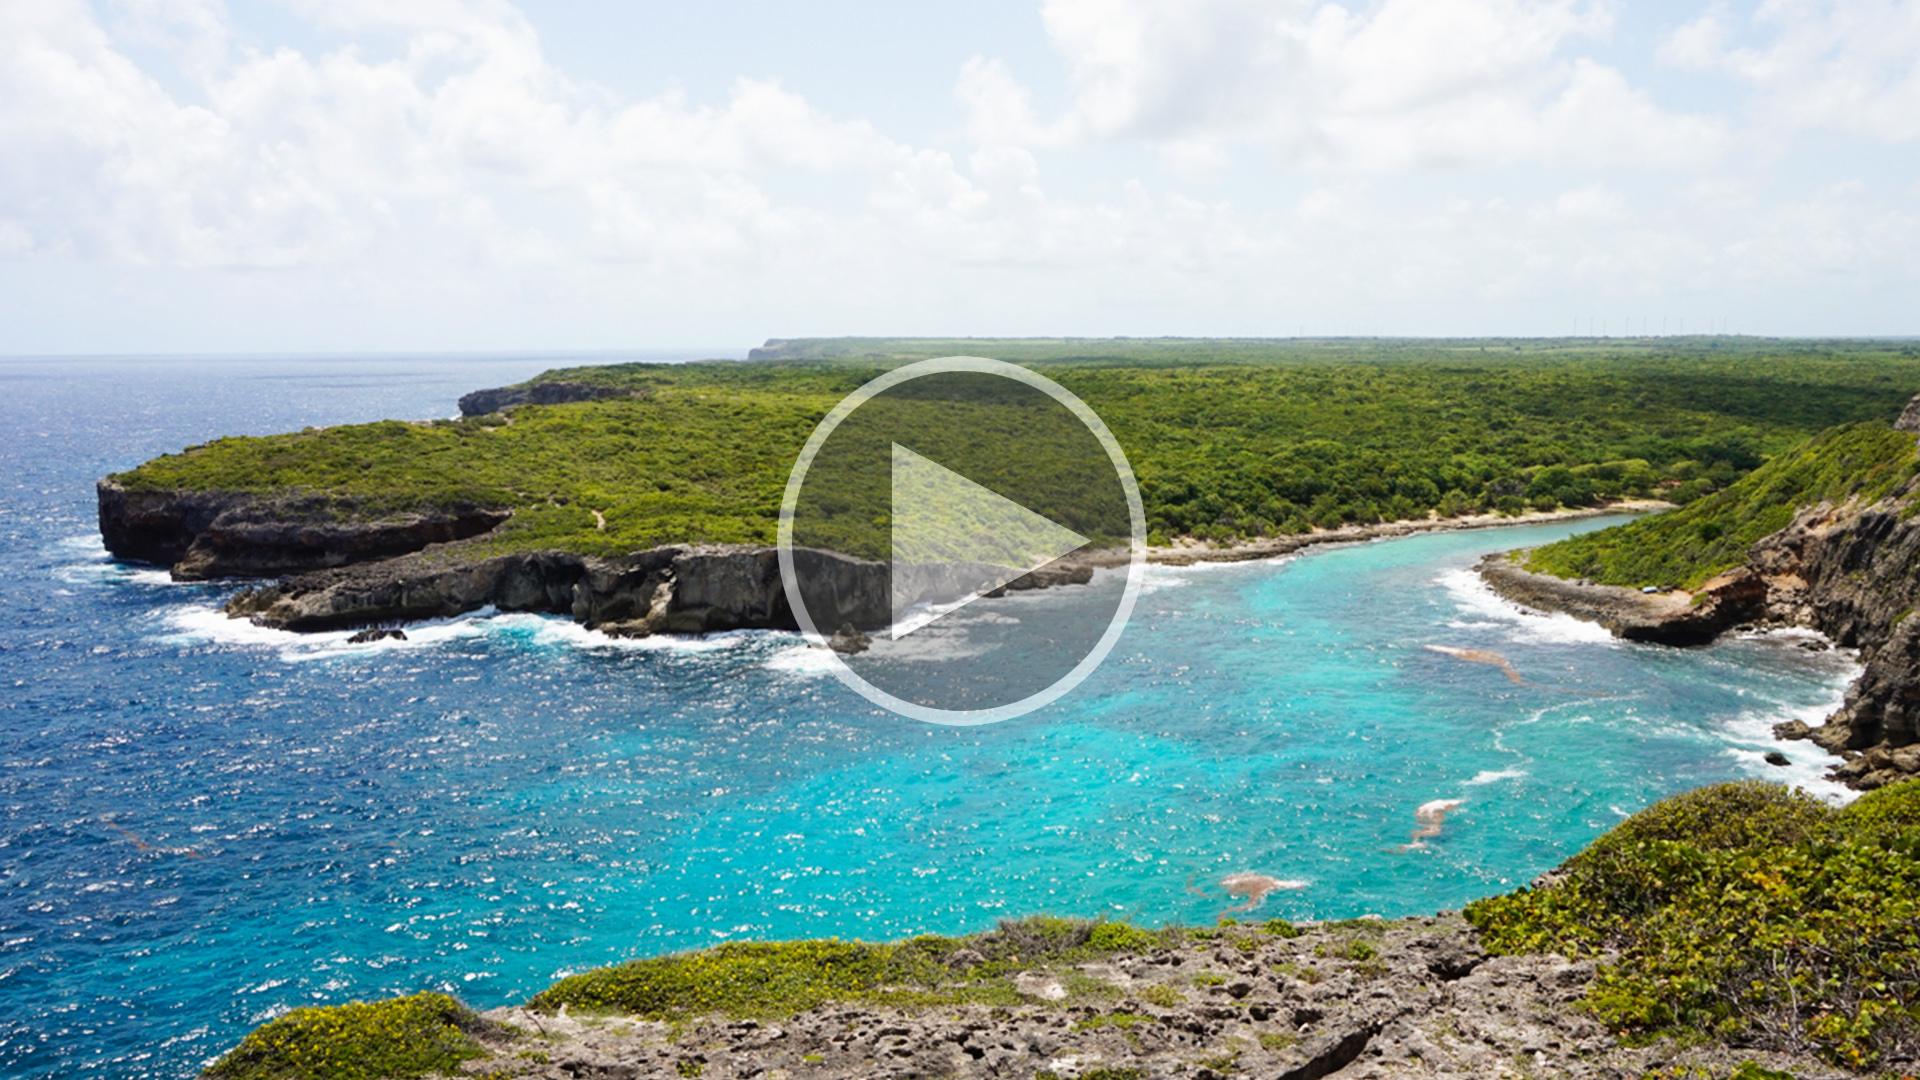 Porte d'Enfer Guadeloupe, panorama falaises